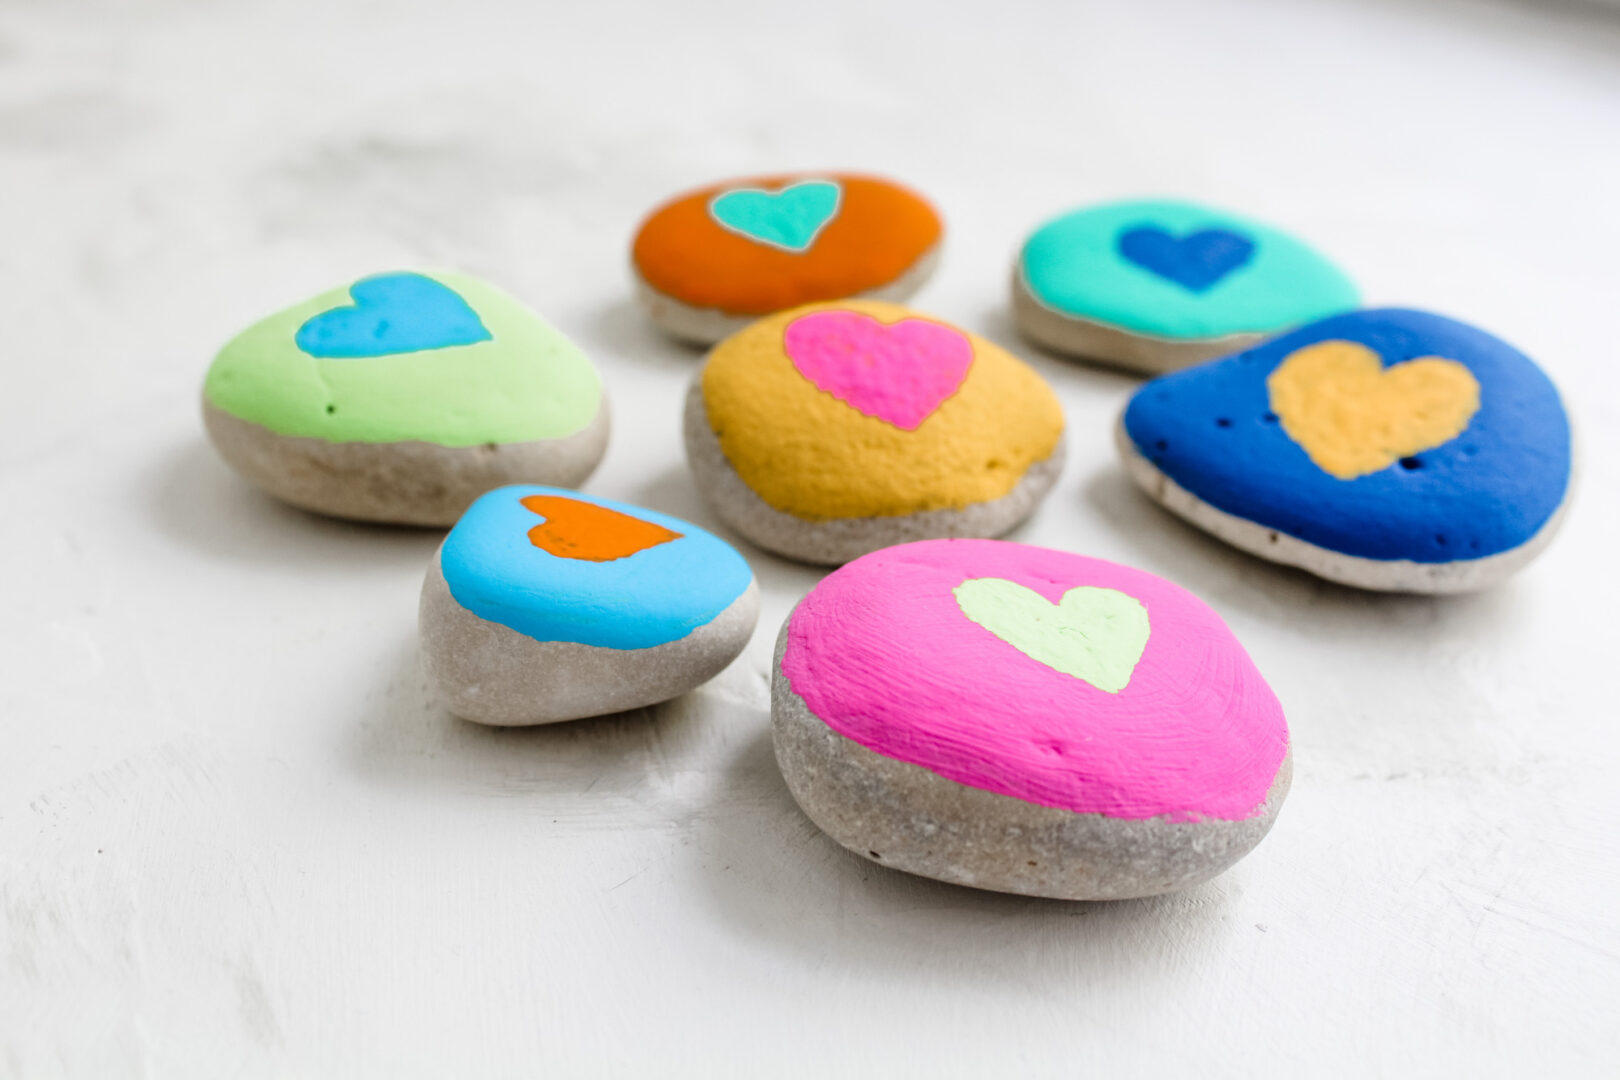 Kids can paint love rocks in celebration of the Rosh Hashanah and Yom Kippur holidays.